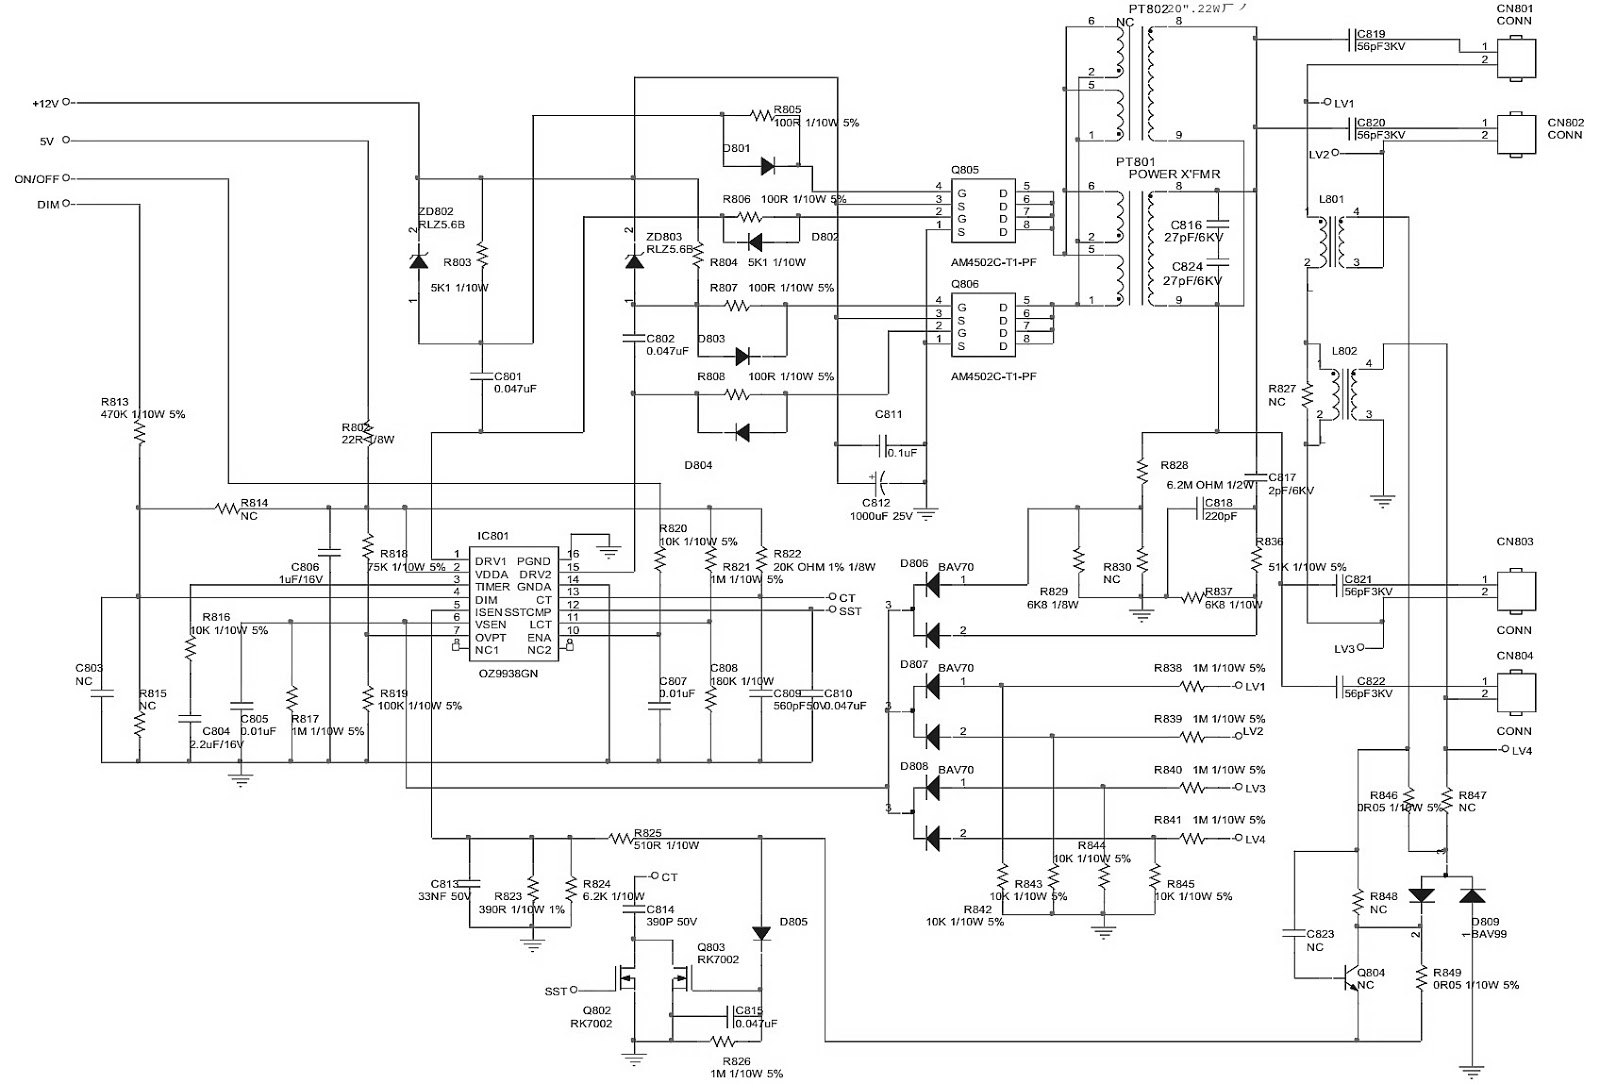 Electro help: 715T 2783 SMPS circuit diagram